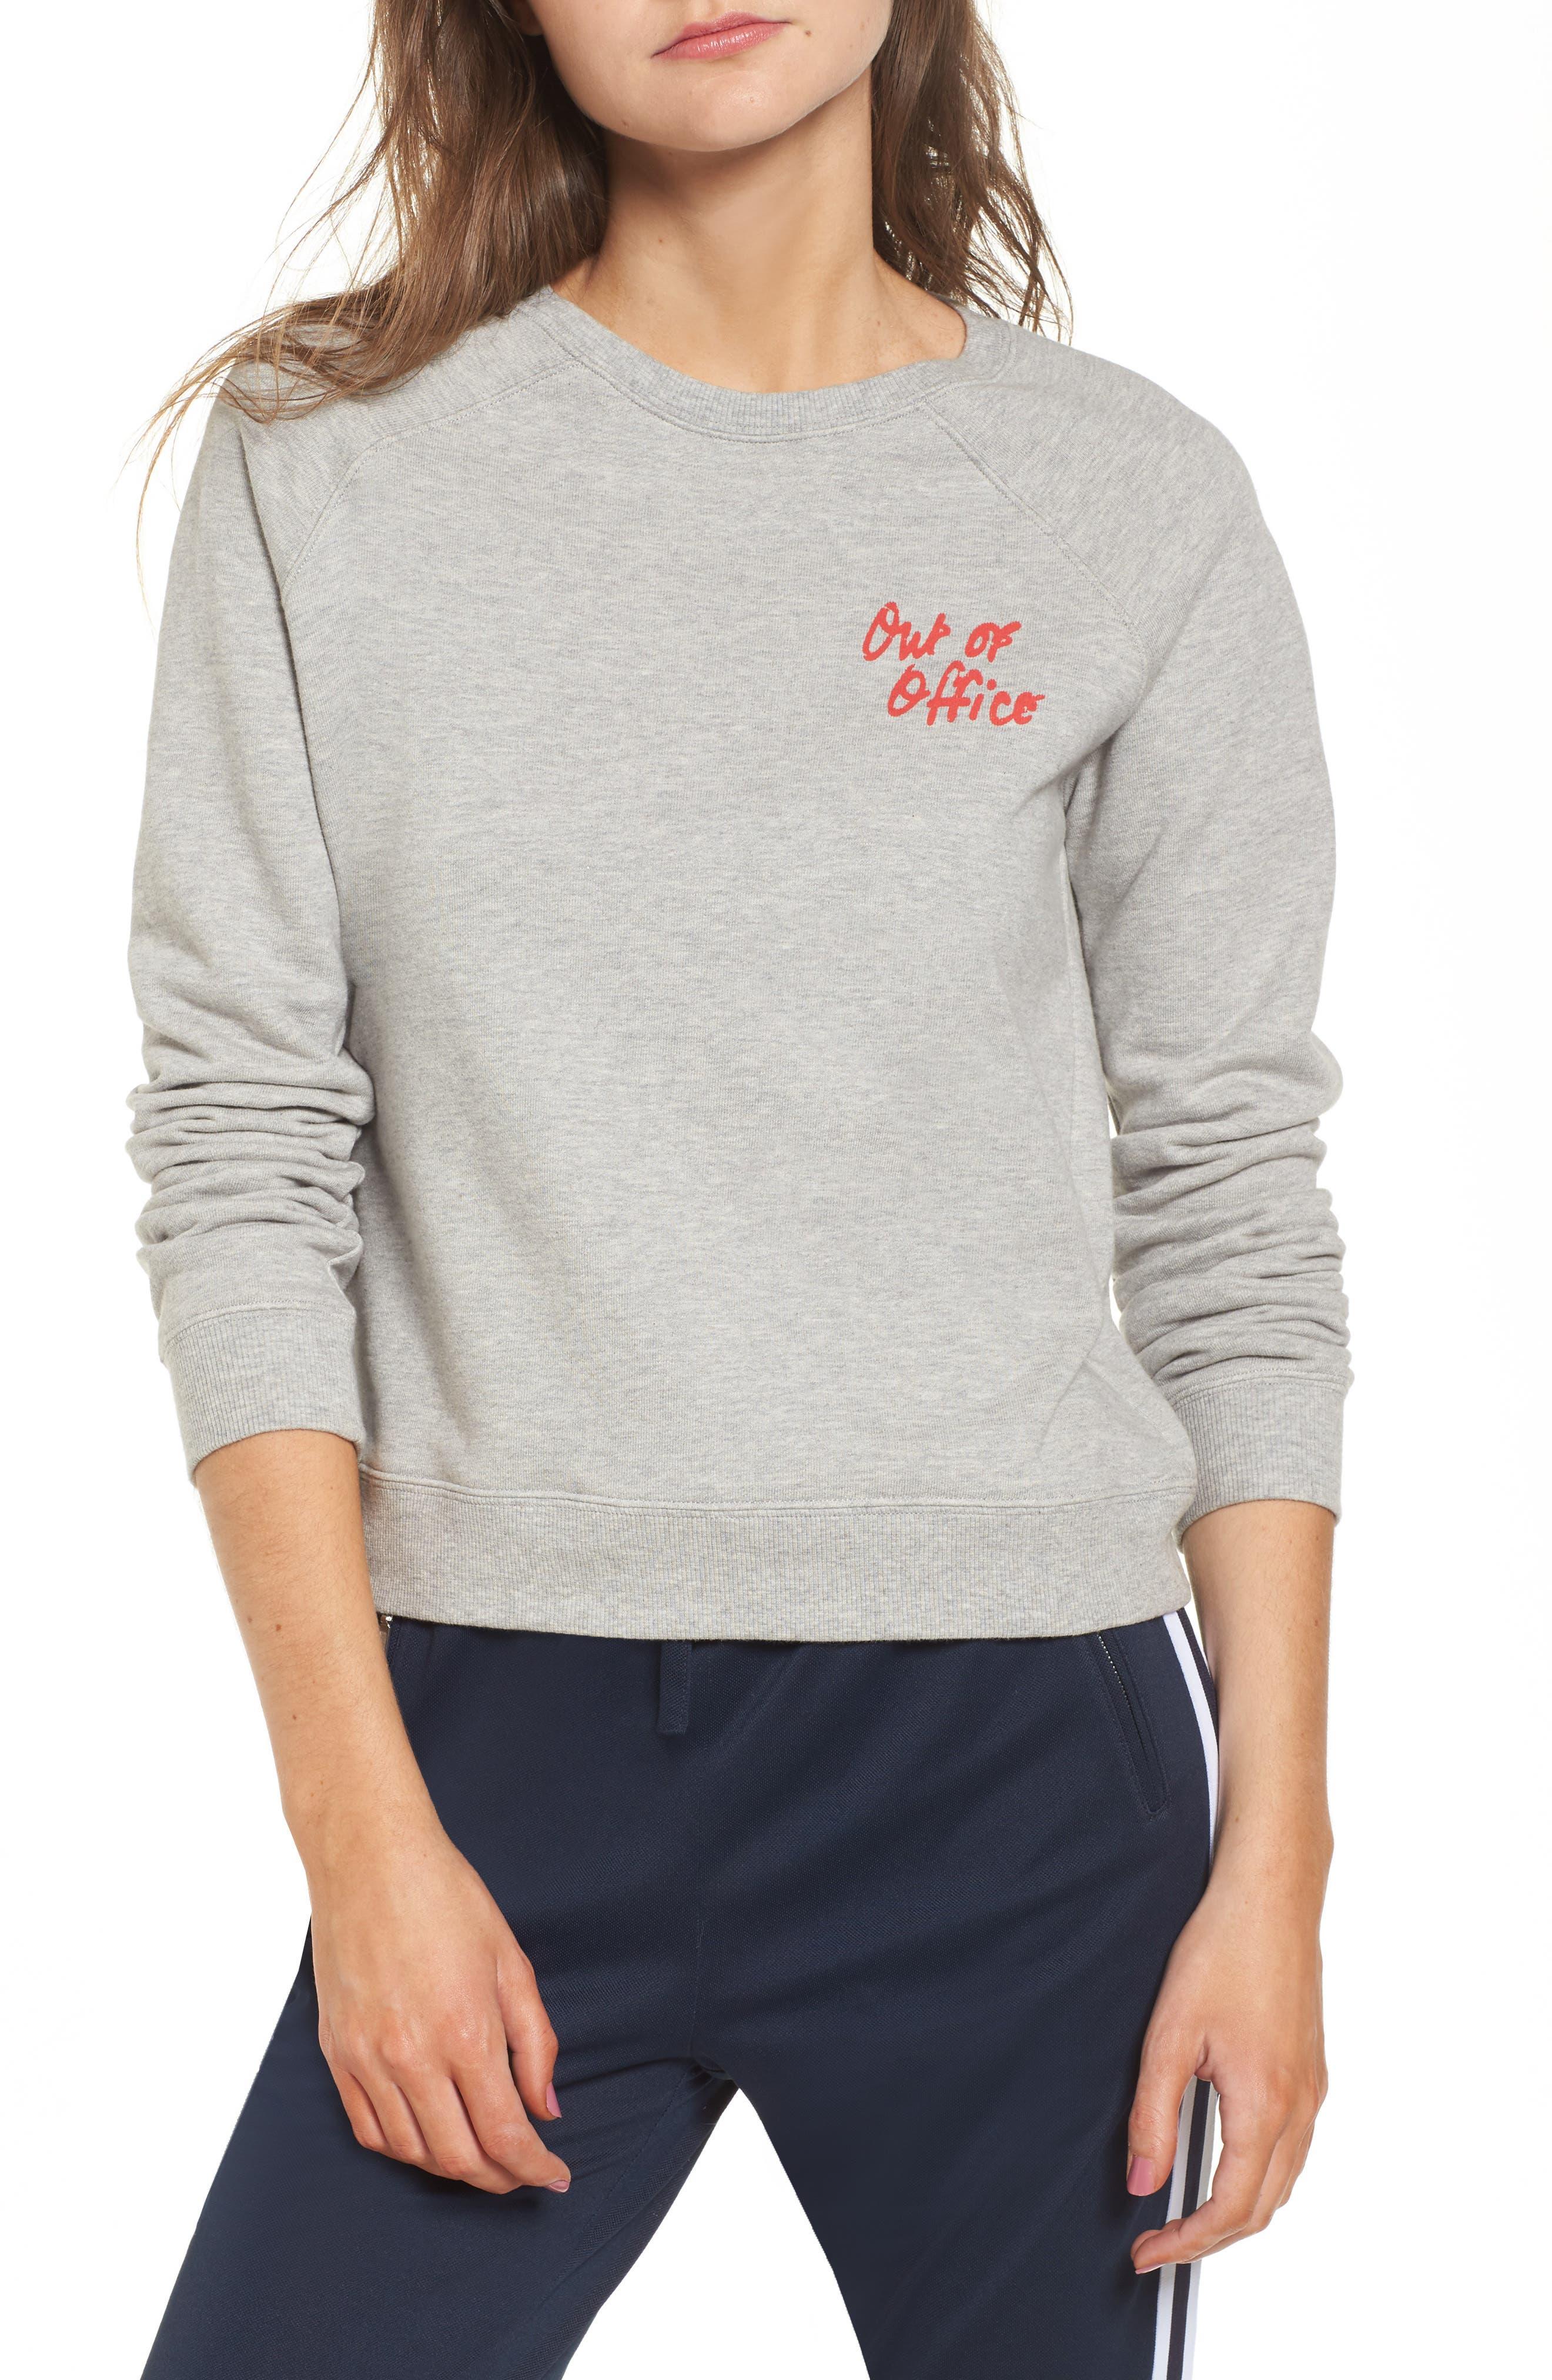 Rebecca Minkoff Out of Office Sweatshirt